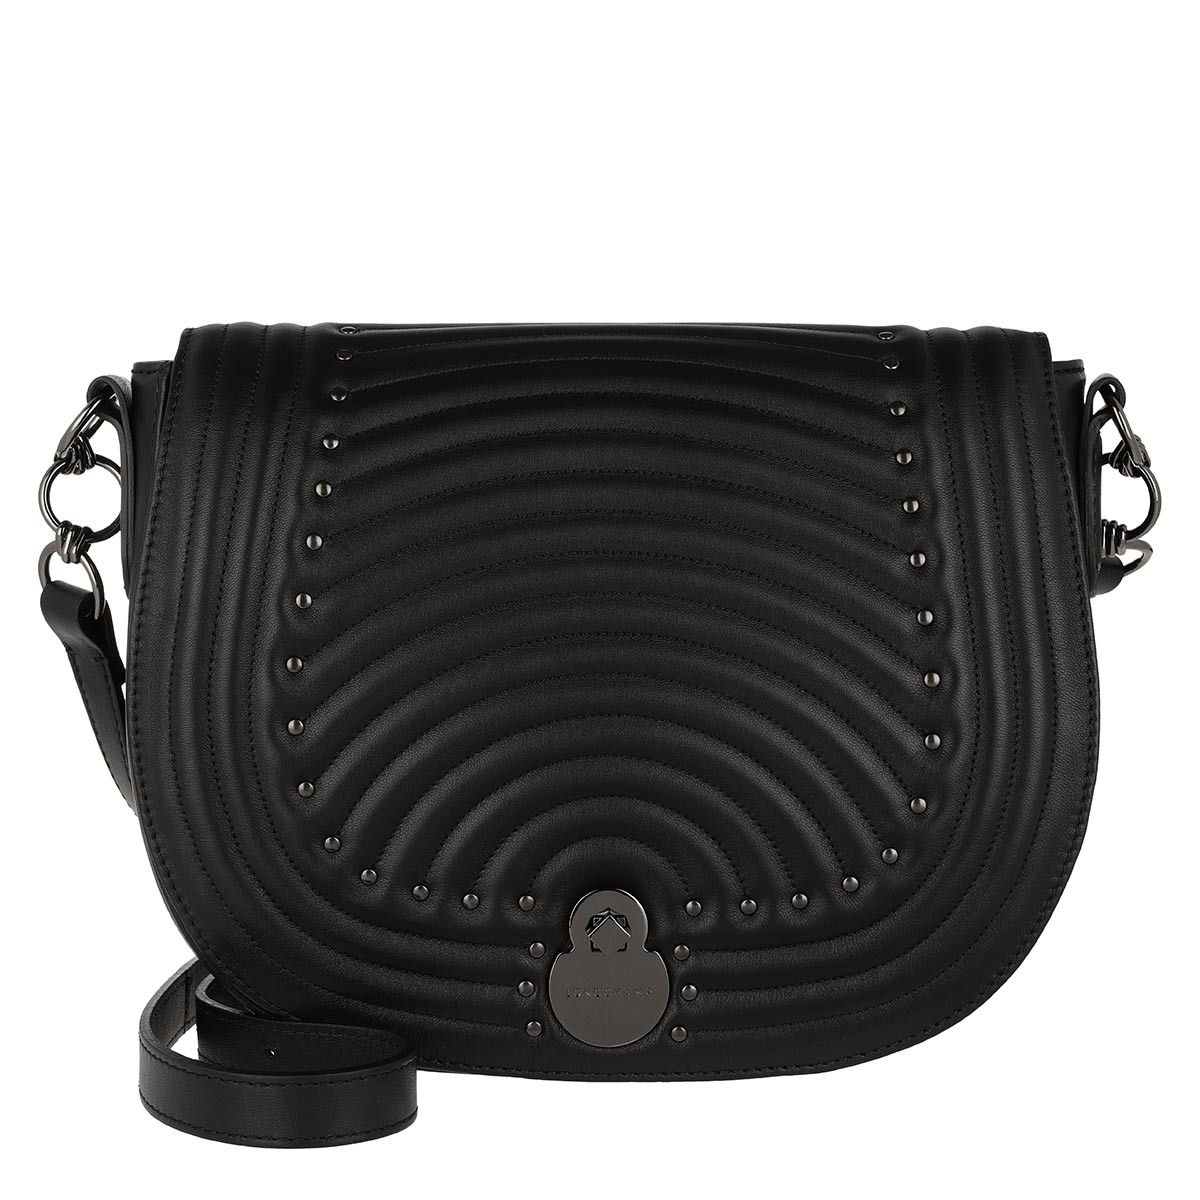 Longchamp Umhängetasche - Cavalcade Matelassé Crossbody Bag Black - in schwarz - für Damen